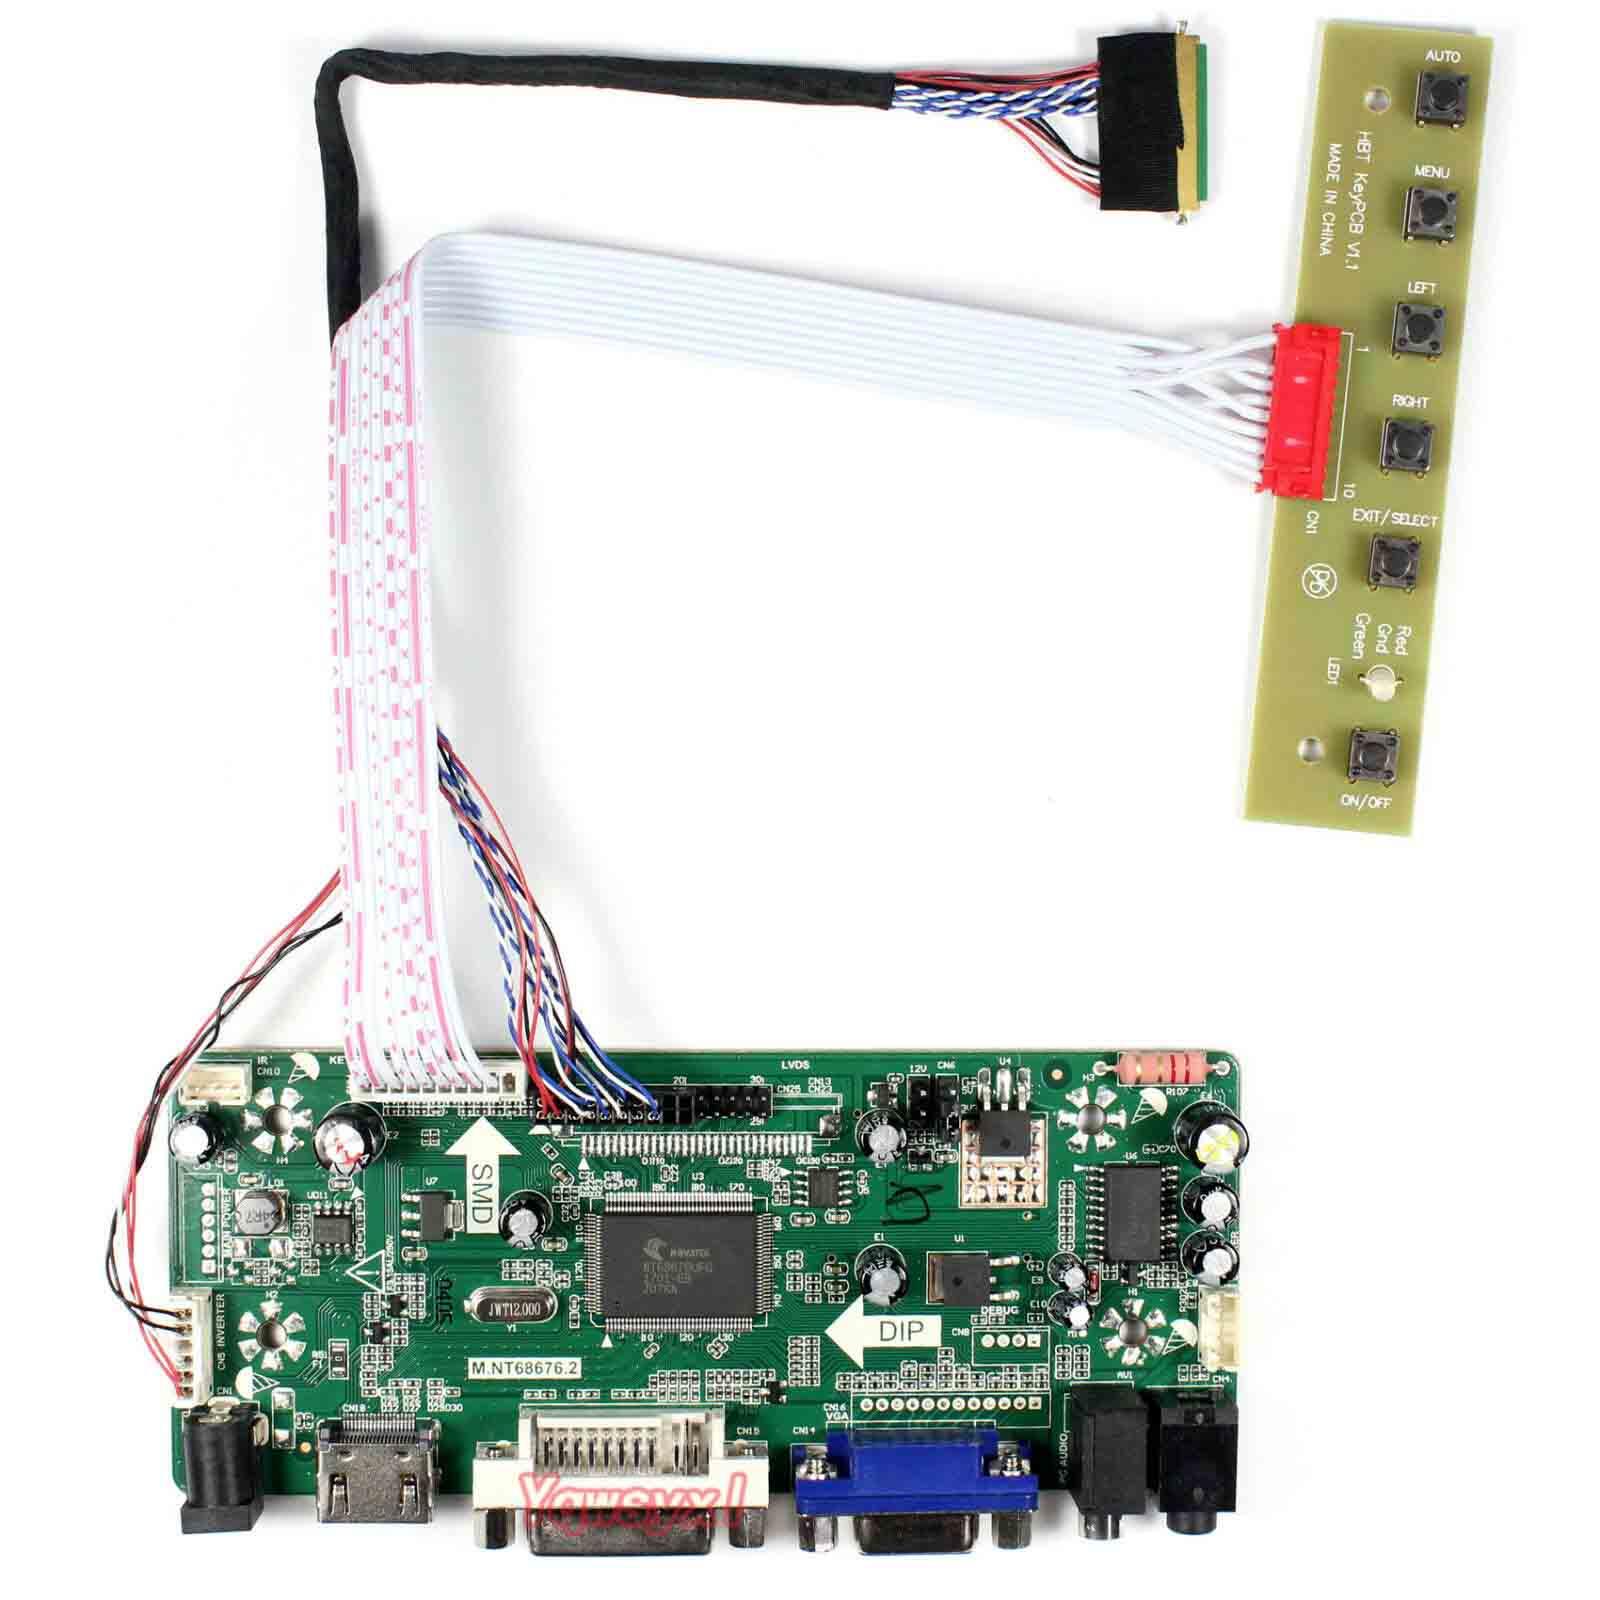 Yqwsyxl Control Board Monitor Kit For LP156WH2-TLEA  LP156WH2(TL)(EA)  HDMI + DVI + VGA LCD LED Screen Controller Board Driver